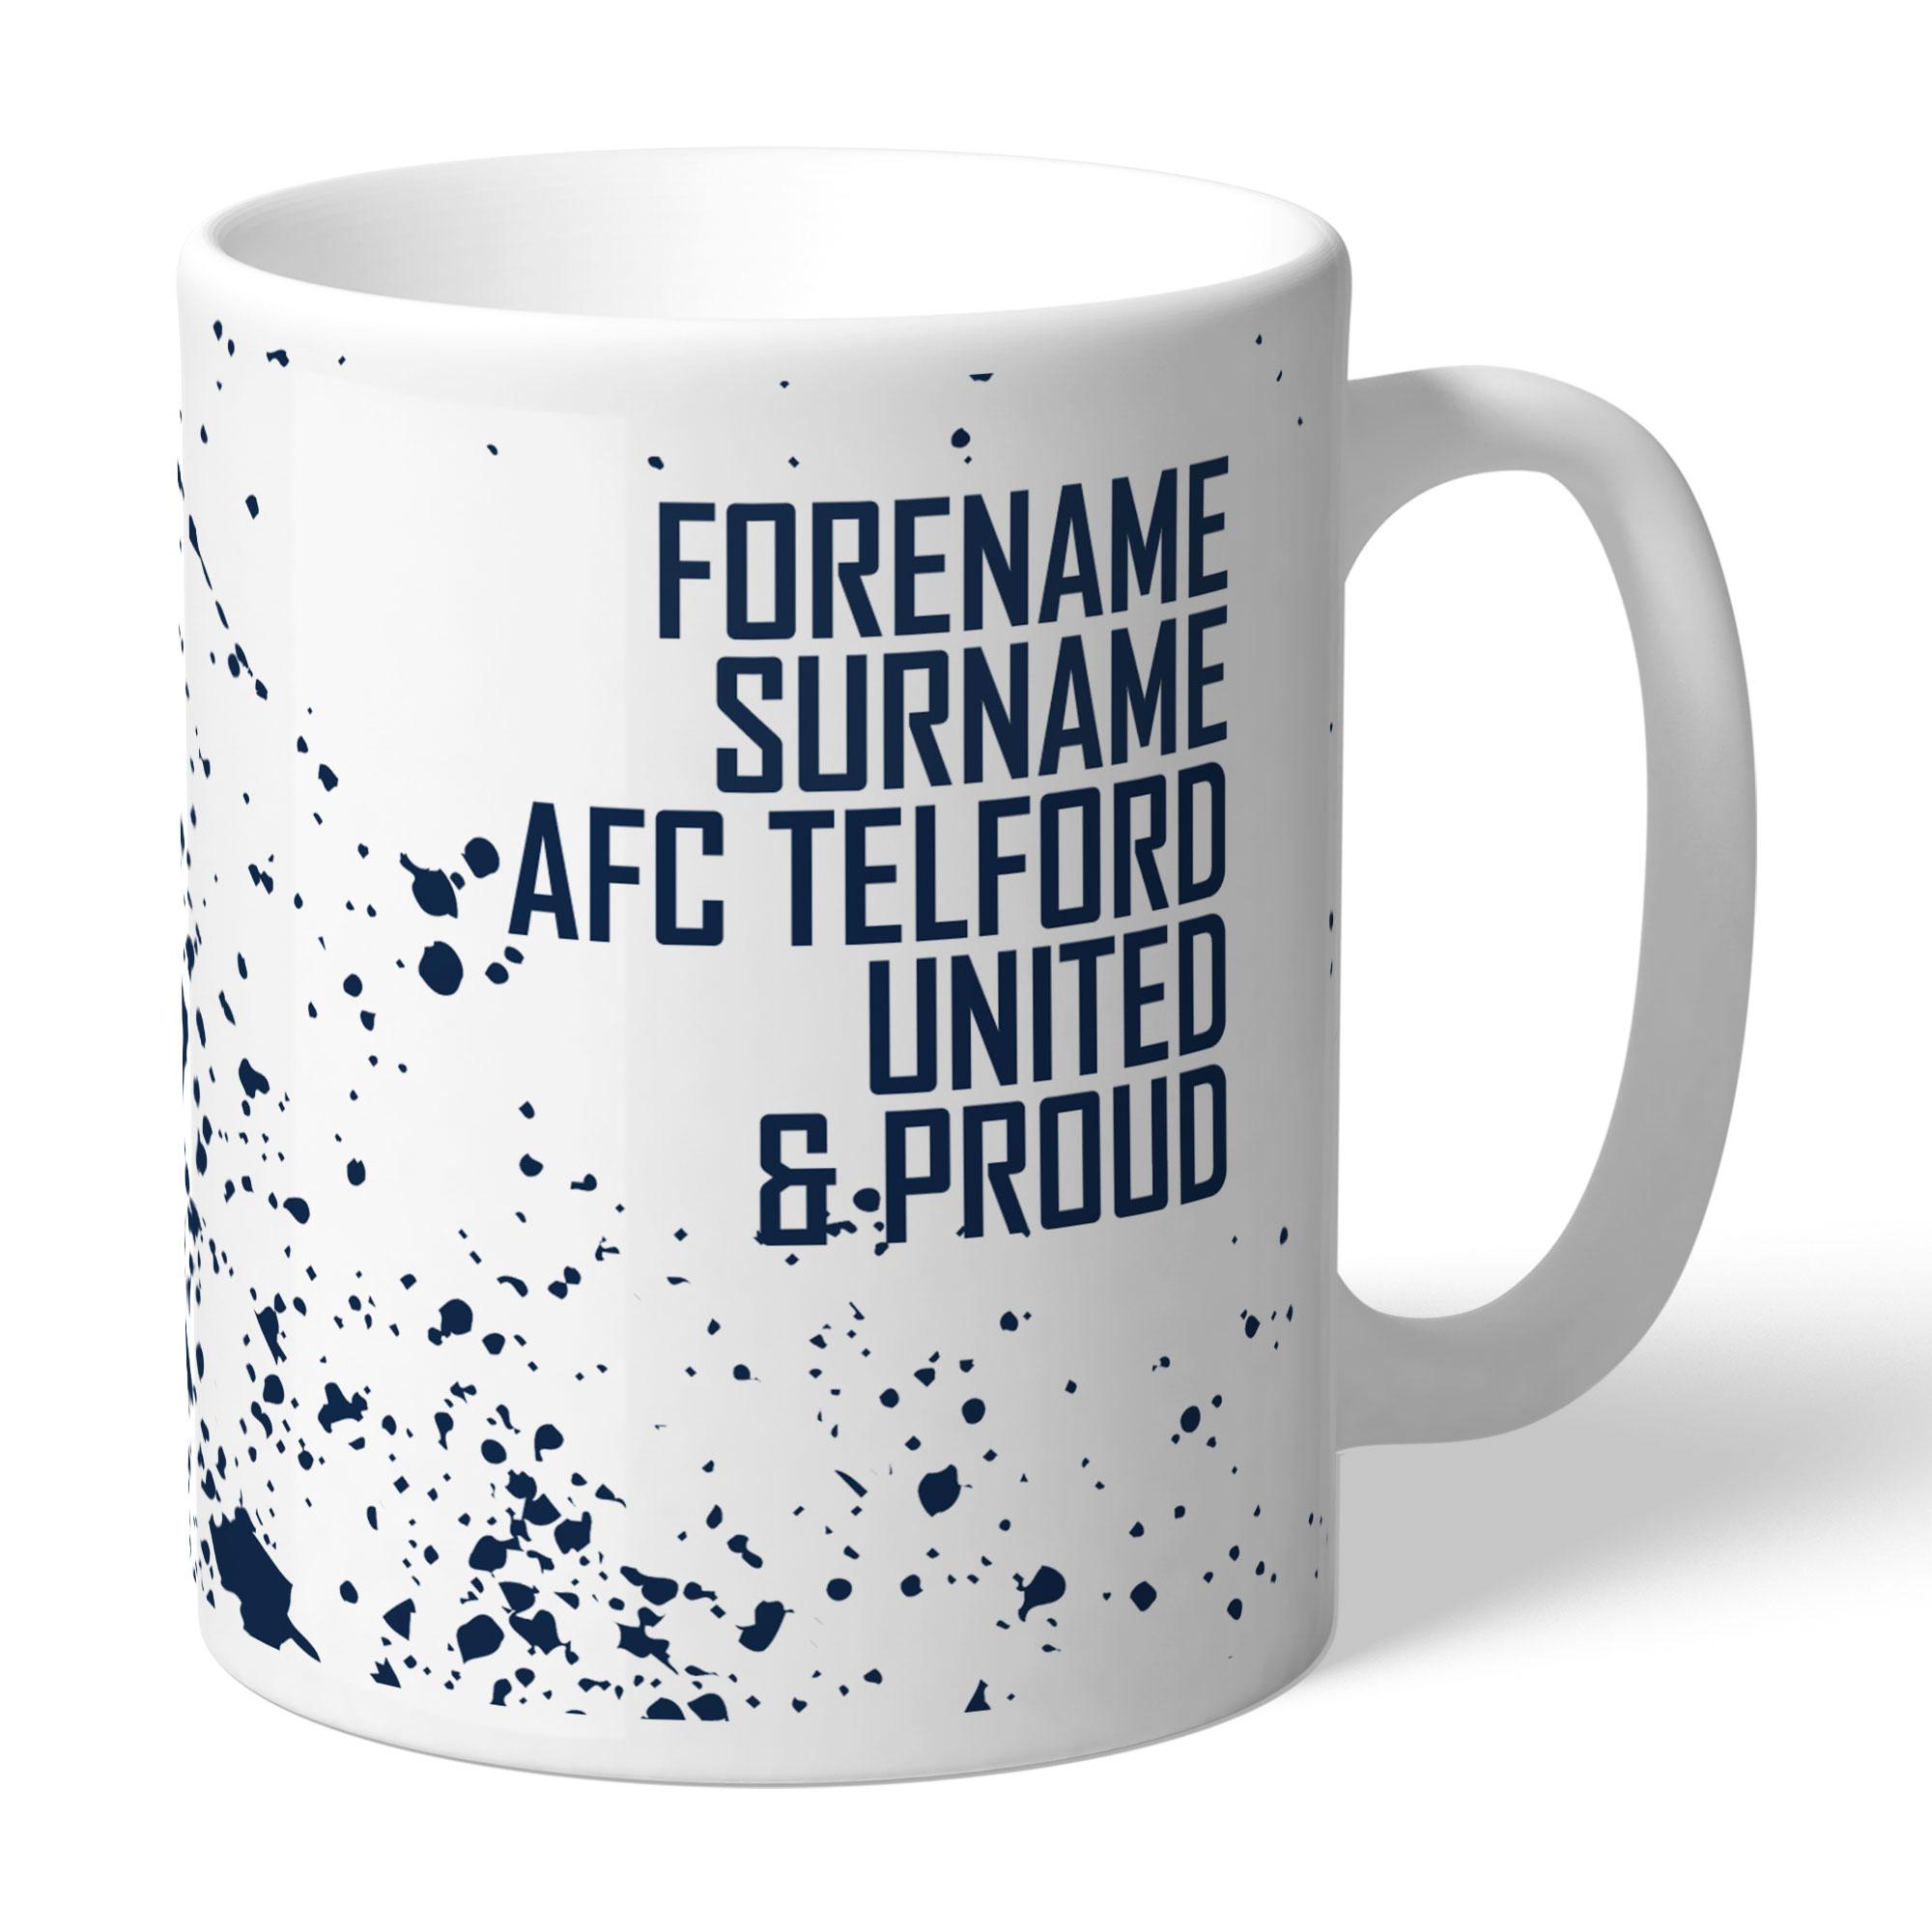 AFC Telford United Proud Mug